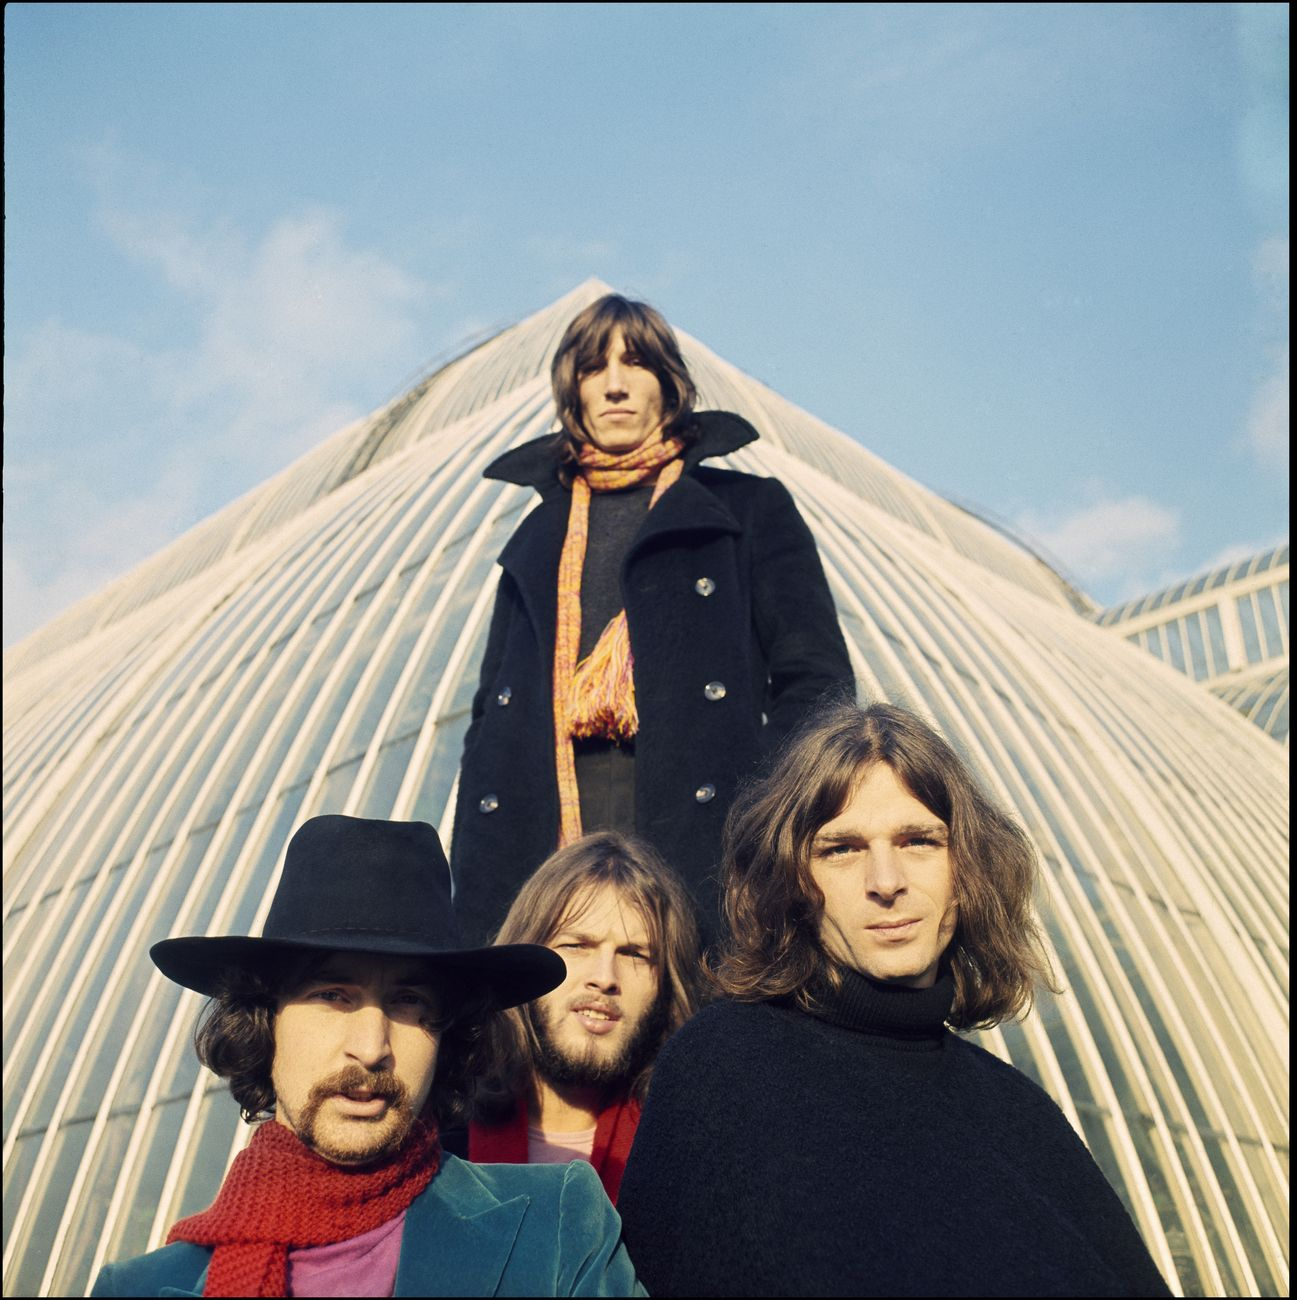 Pink Floyd. Photo Storm Thorgerson © Pink Floyd Music Ltd